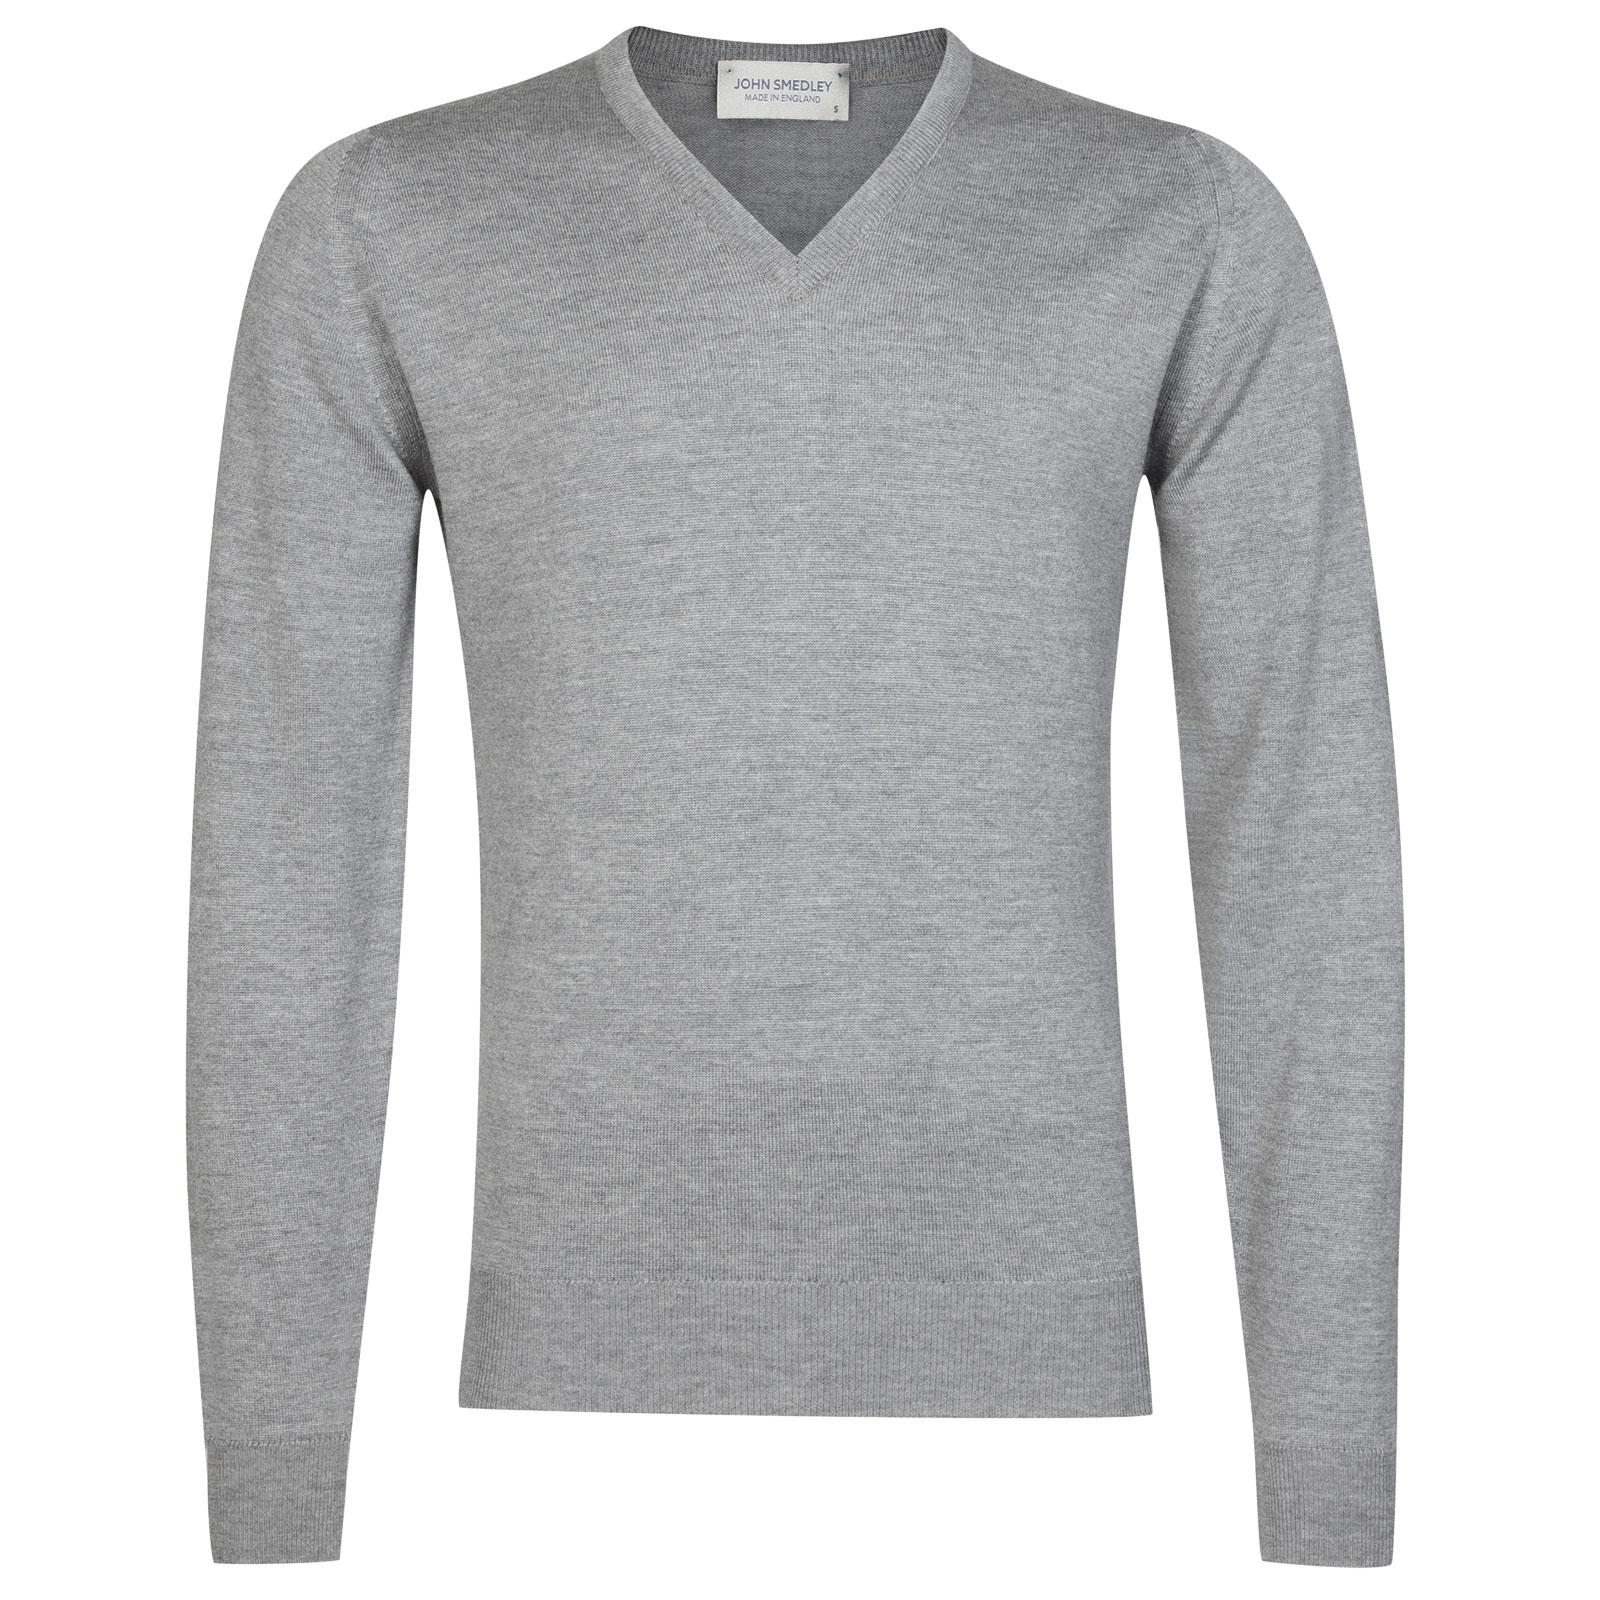 John Smedley Riber Merino Wool Pullover in Silver-M